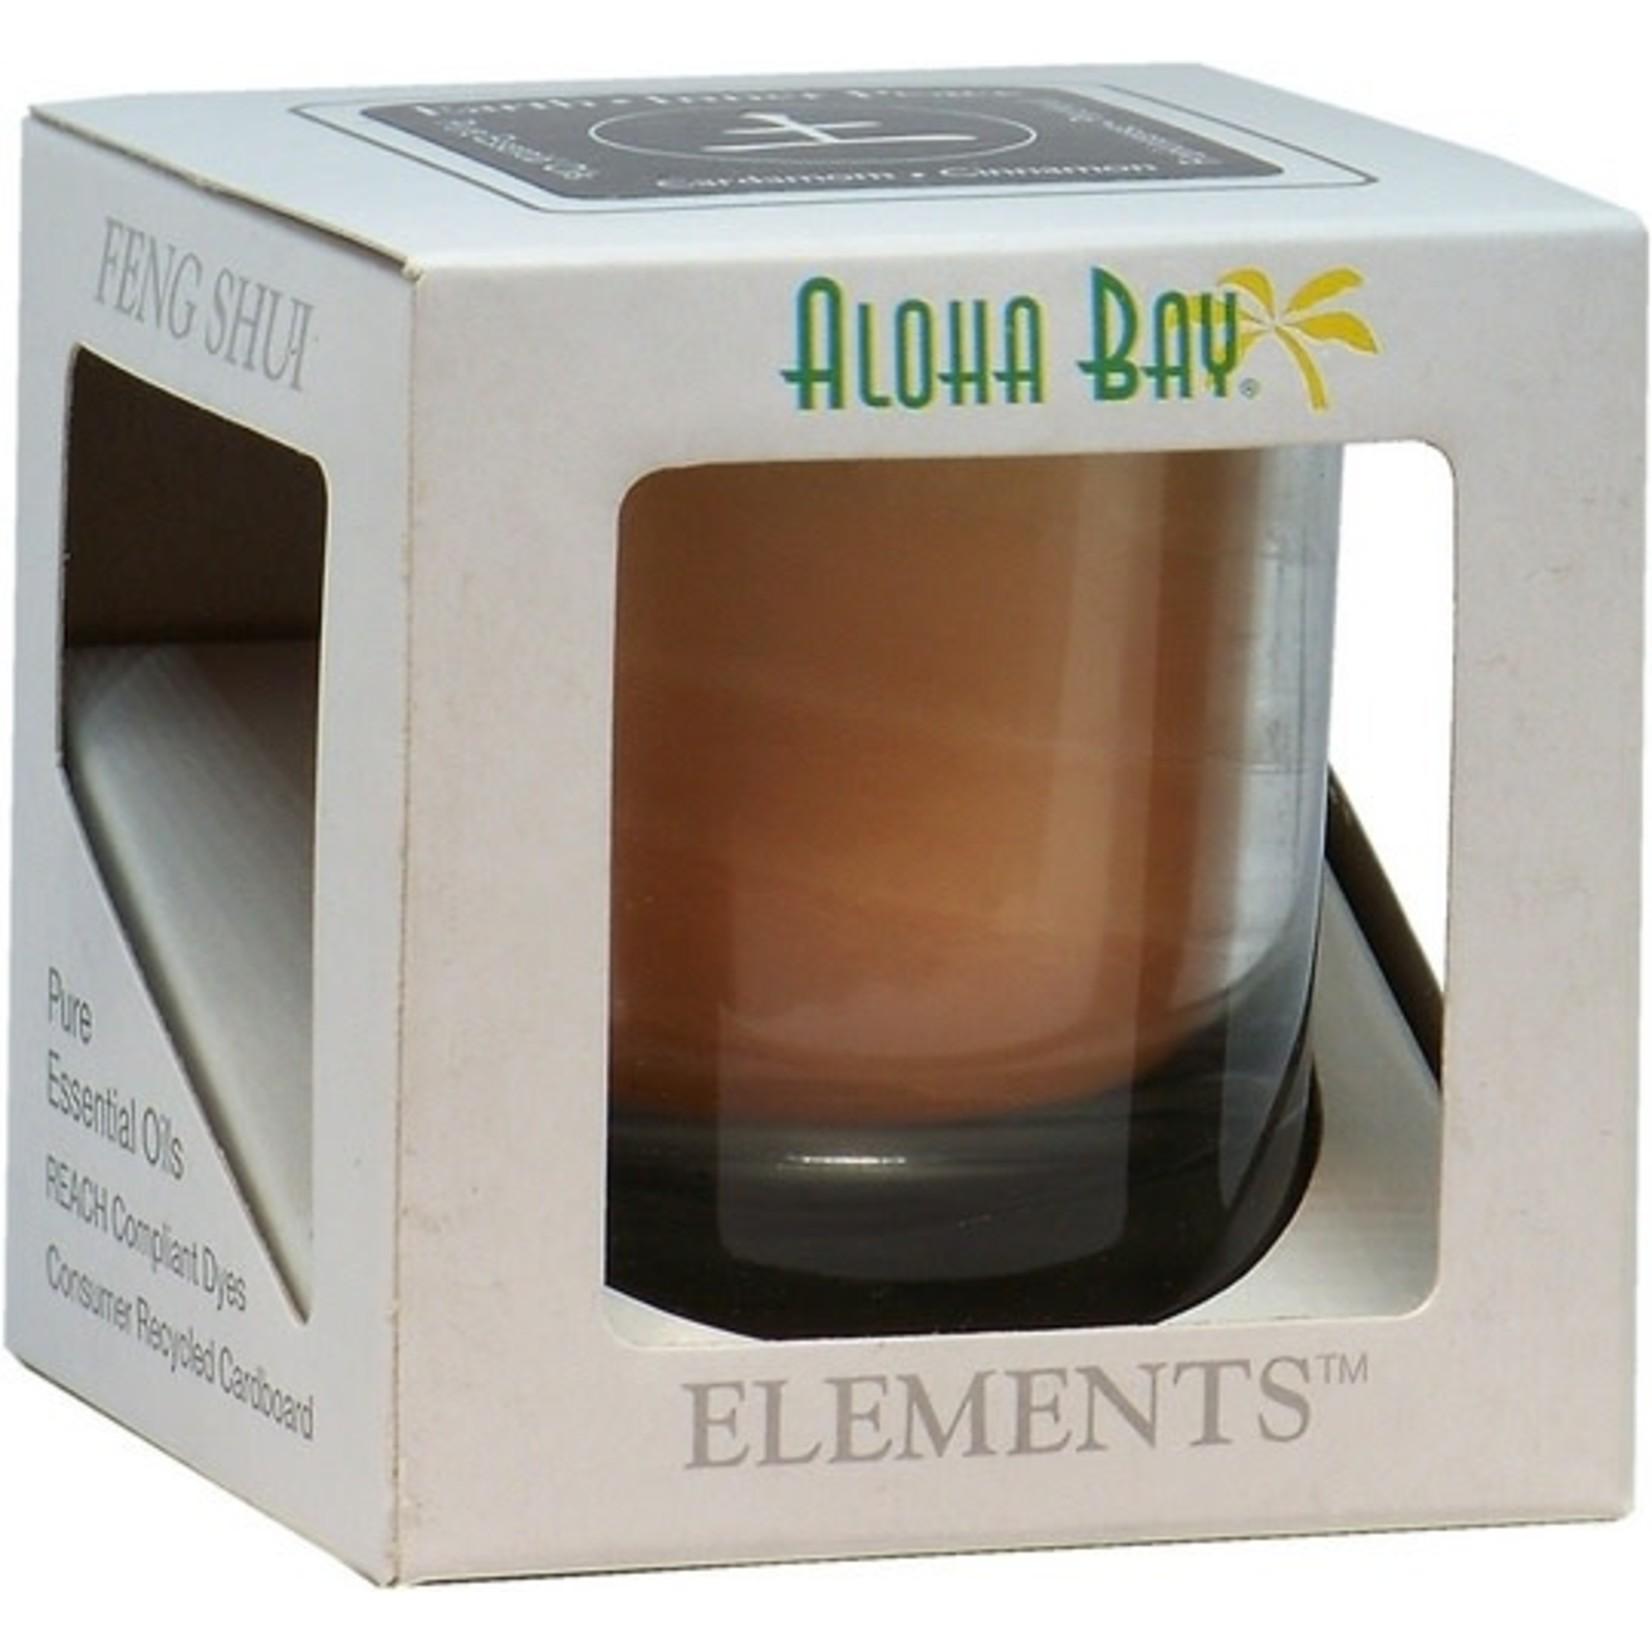 Aloha Bay Feng Shui Jar Candles in Gift Box